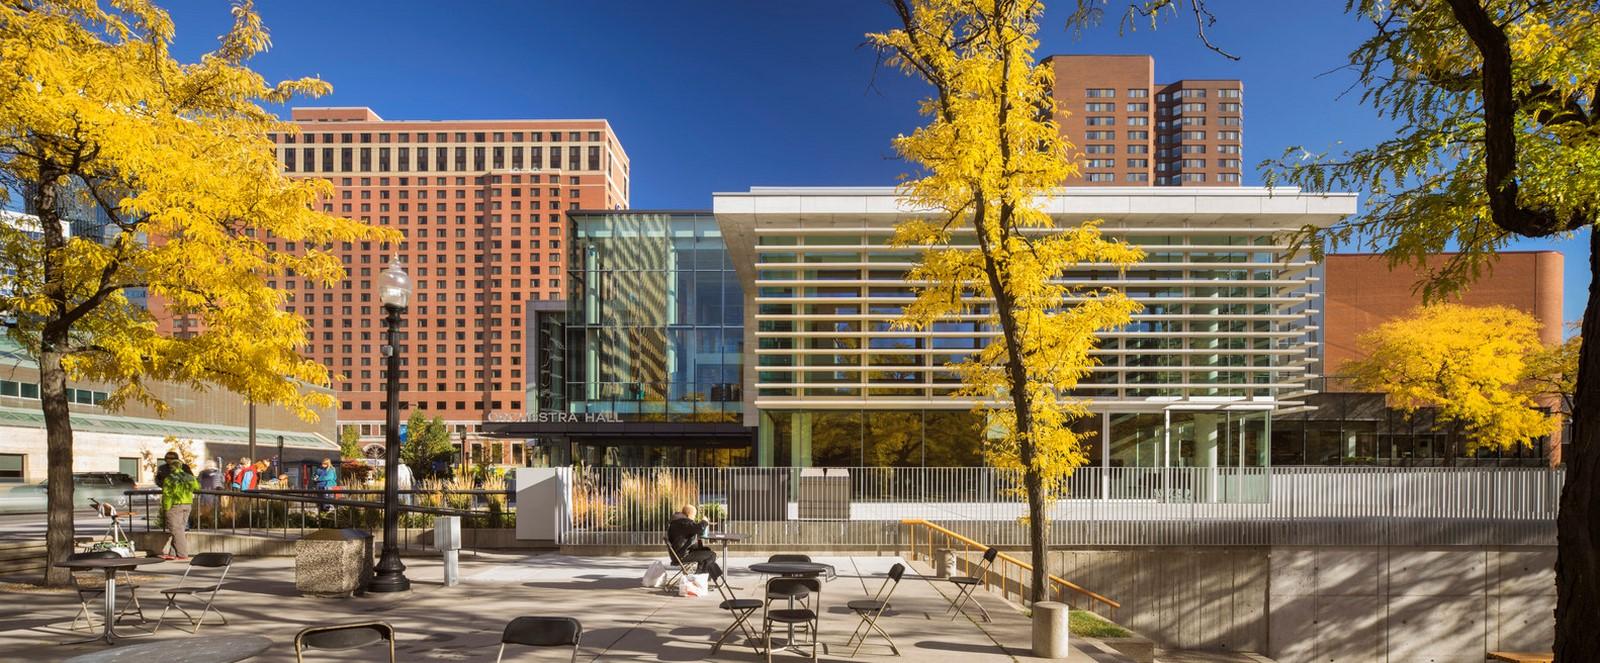 Minnesota Orchestra Hall, Minneapolis, United States - Sheet1